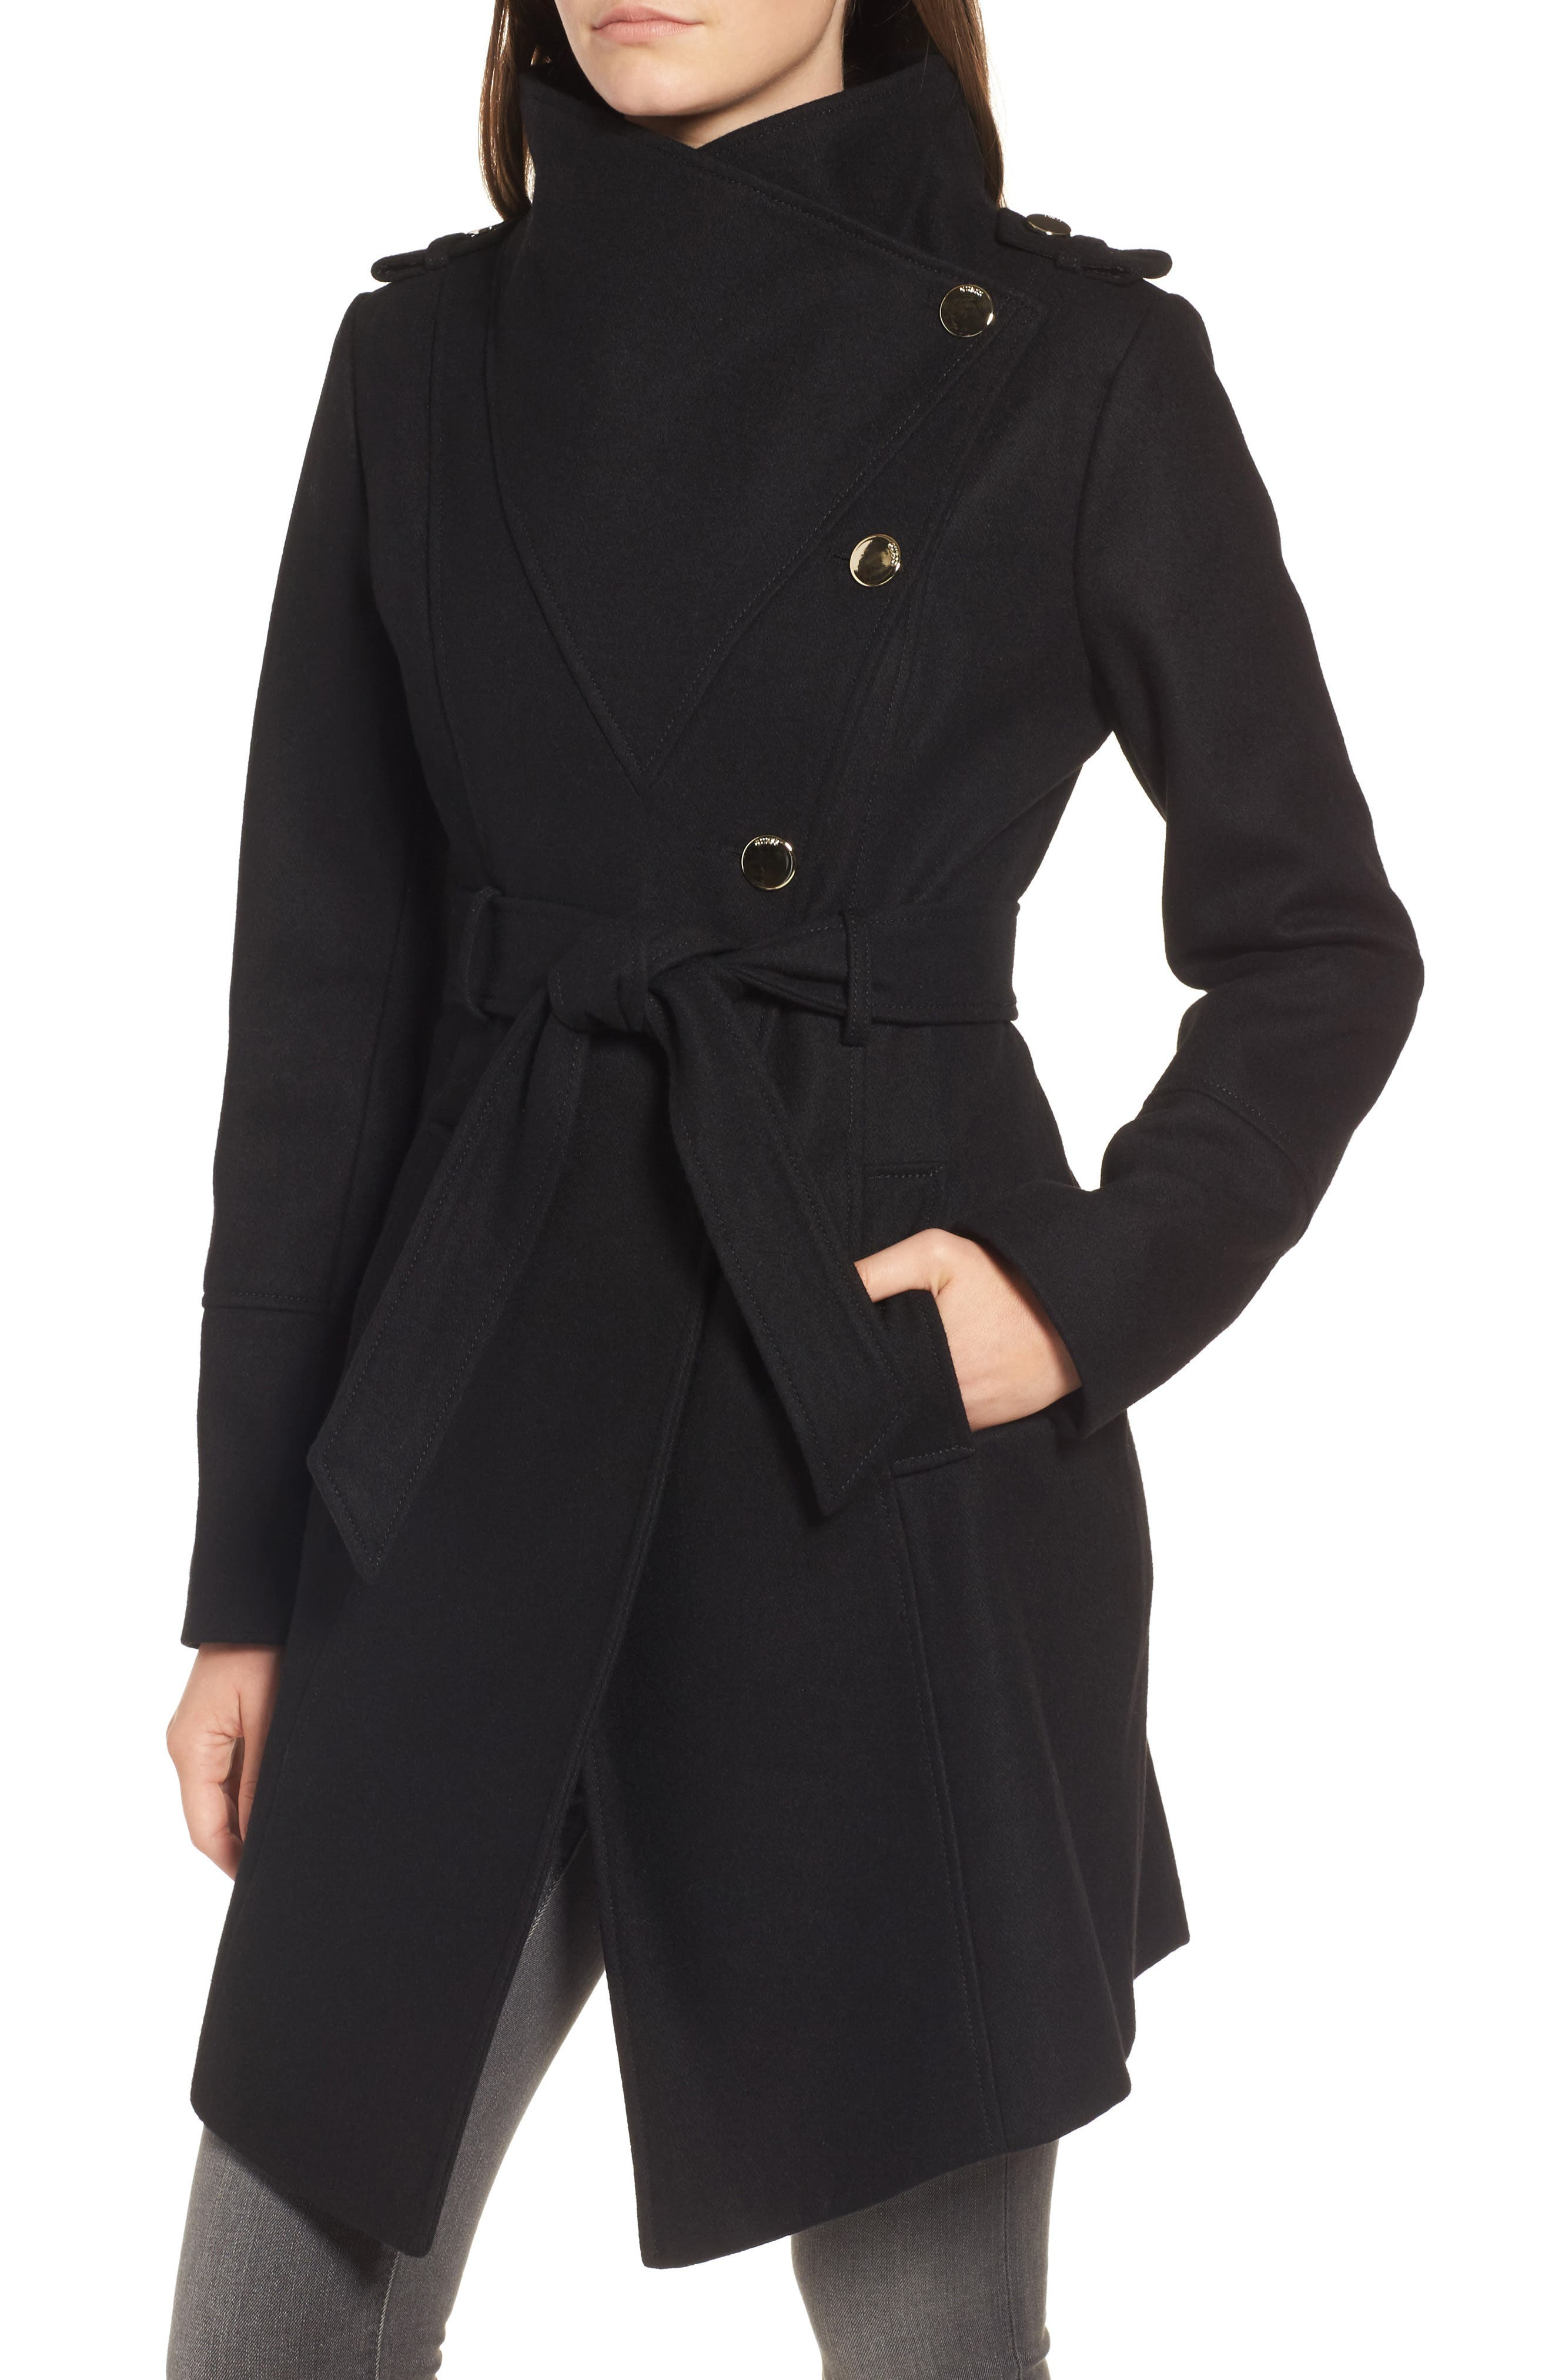 Wrap Trench Coat,                             Alternate thumbnail 4, color,                             Black